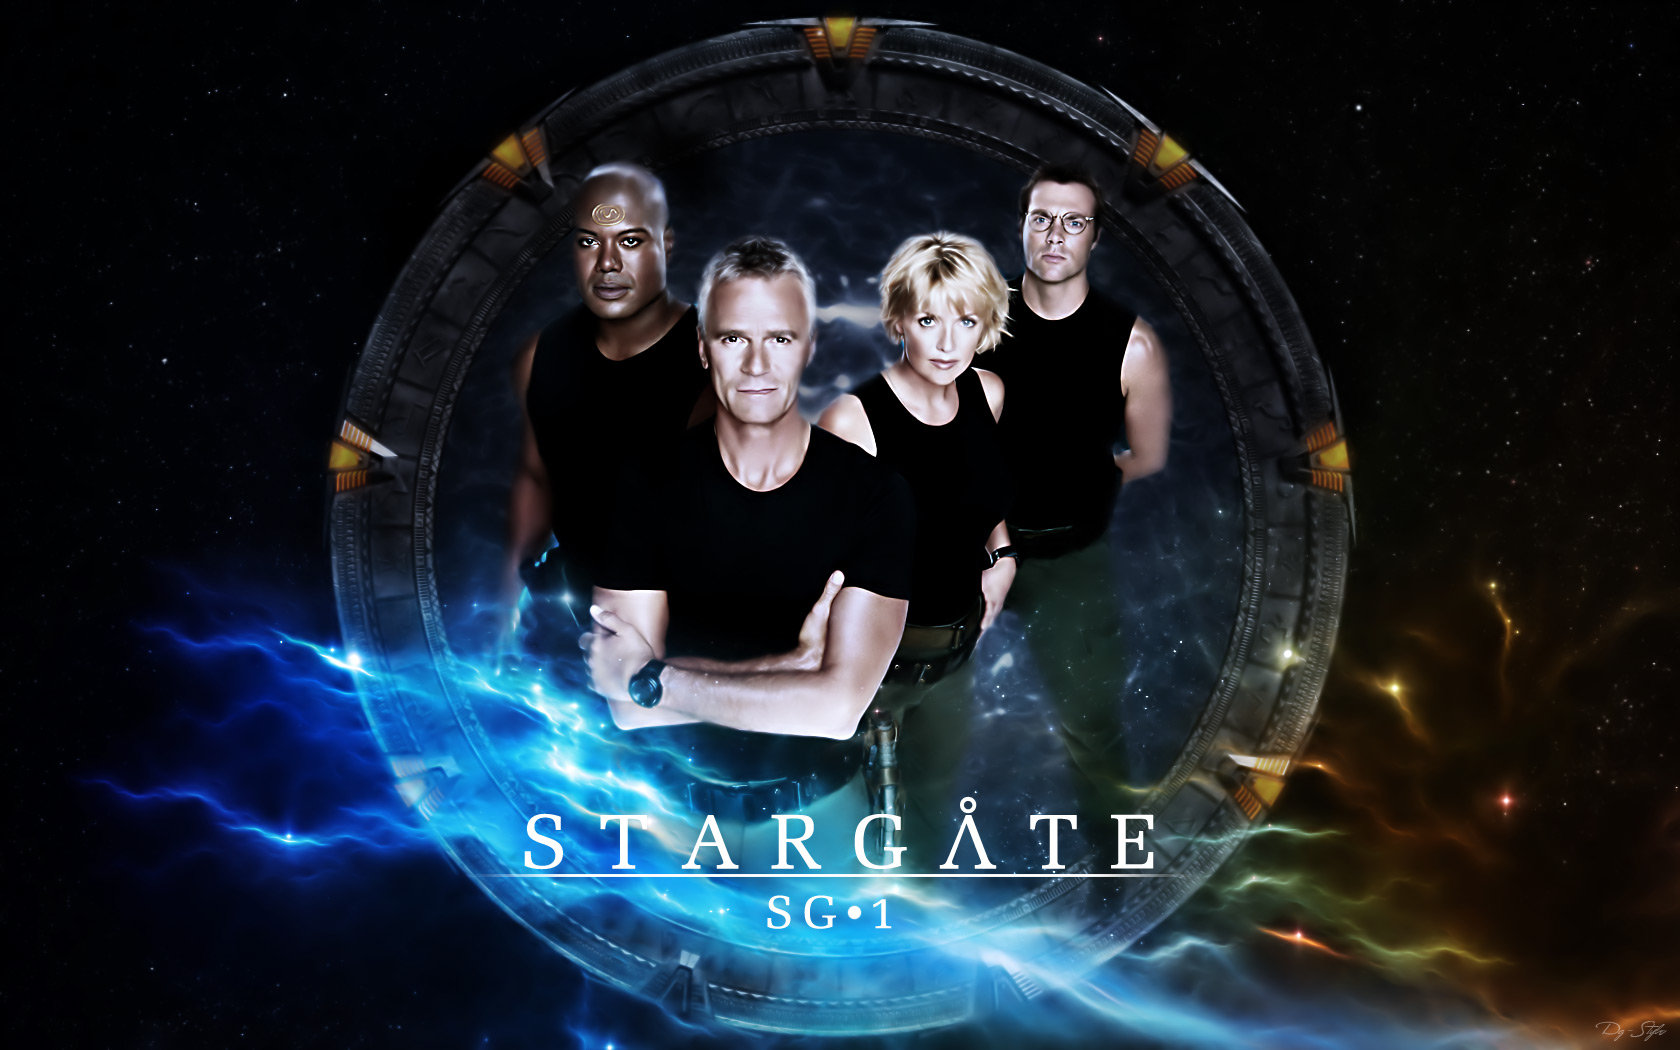 [42+] Stargate SG 1 Wallpaper HD on WallpaperSafari